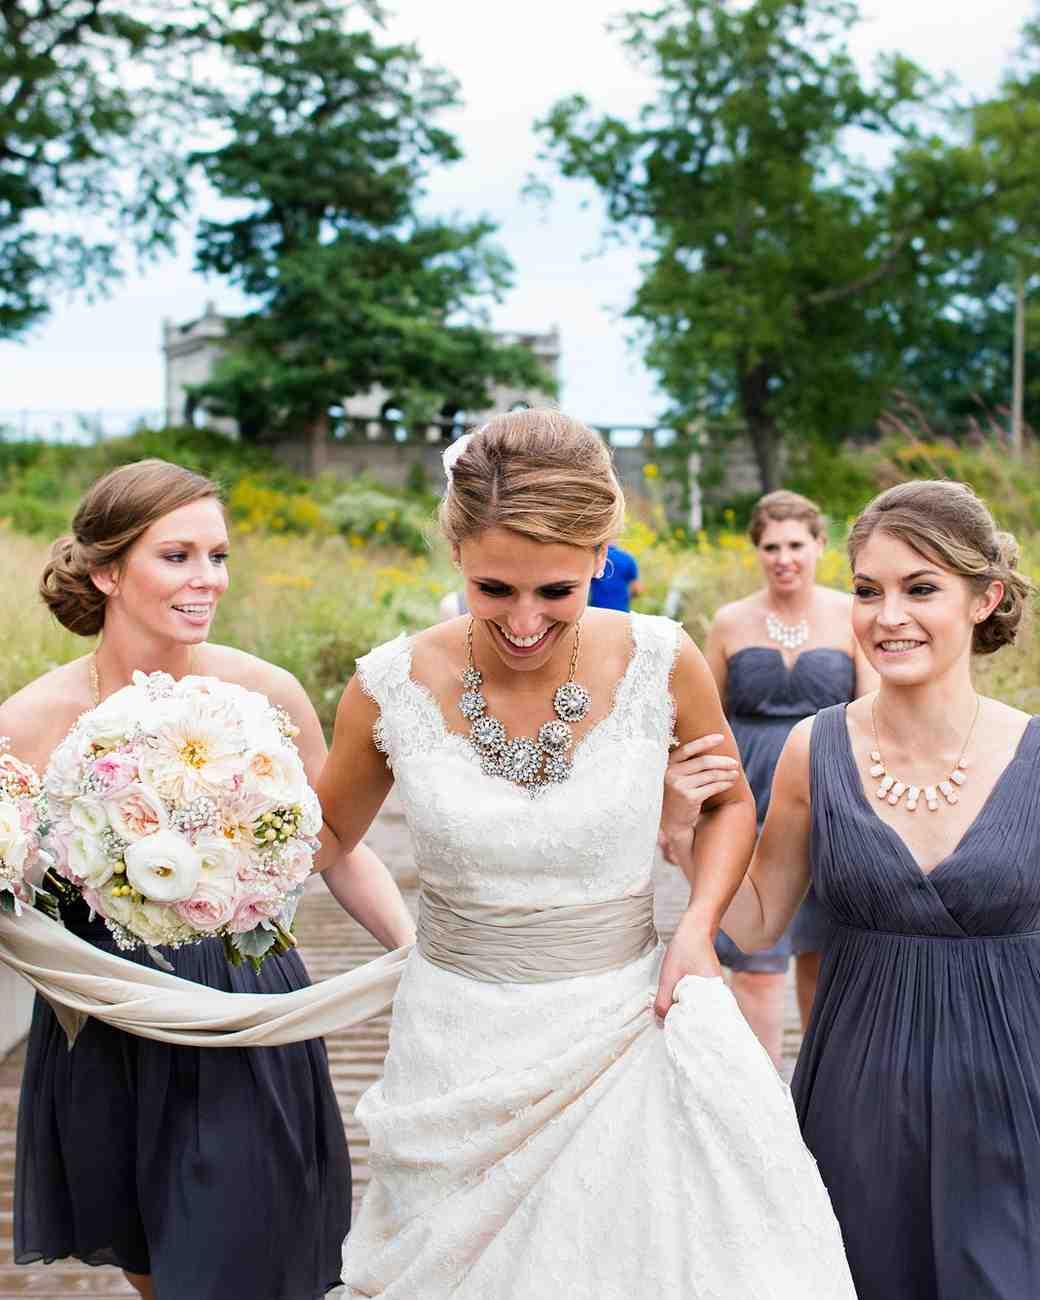 bridal-party-candids-4-0416.jpg